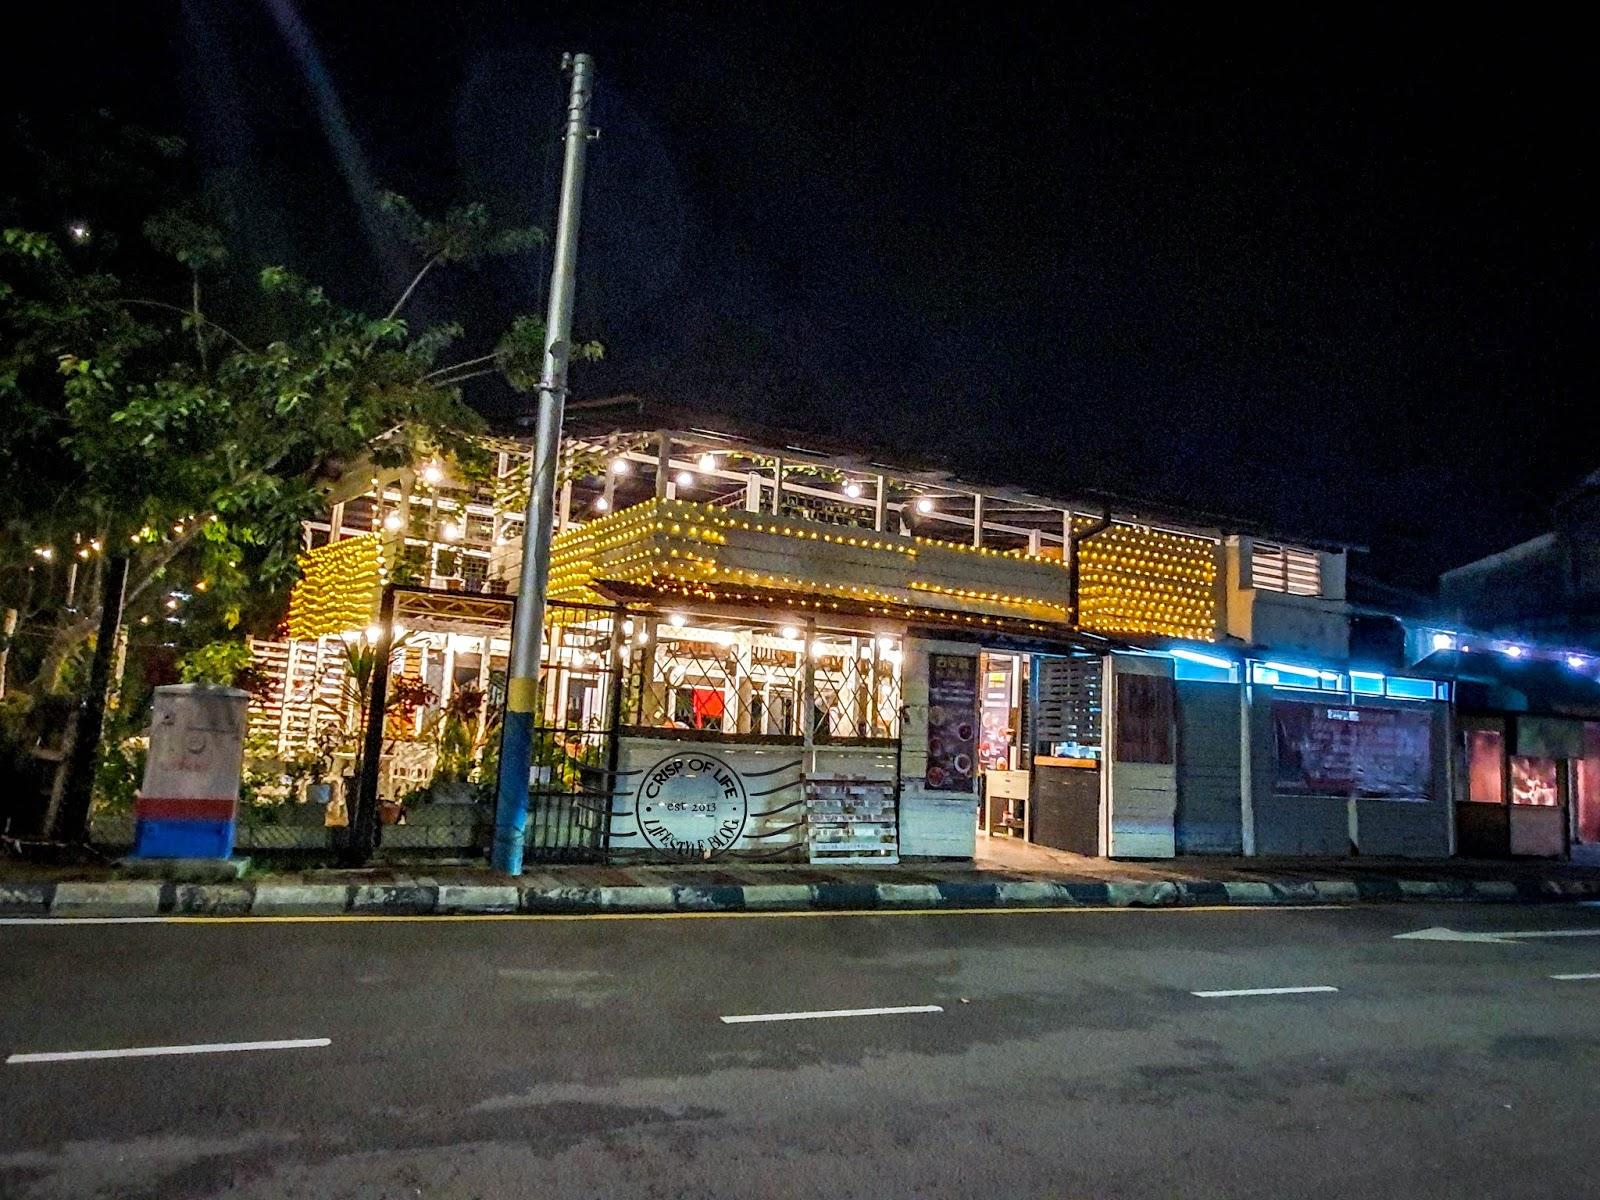 Pallet Garden Cafe @ Lebuh Carnarvon, Georgetown, Penang